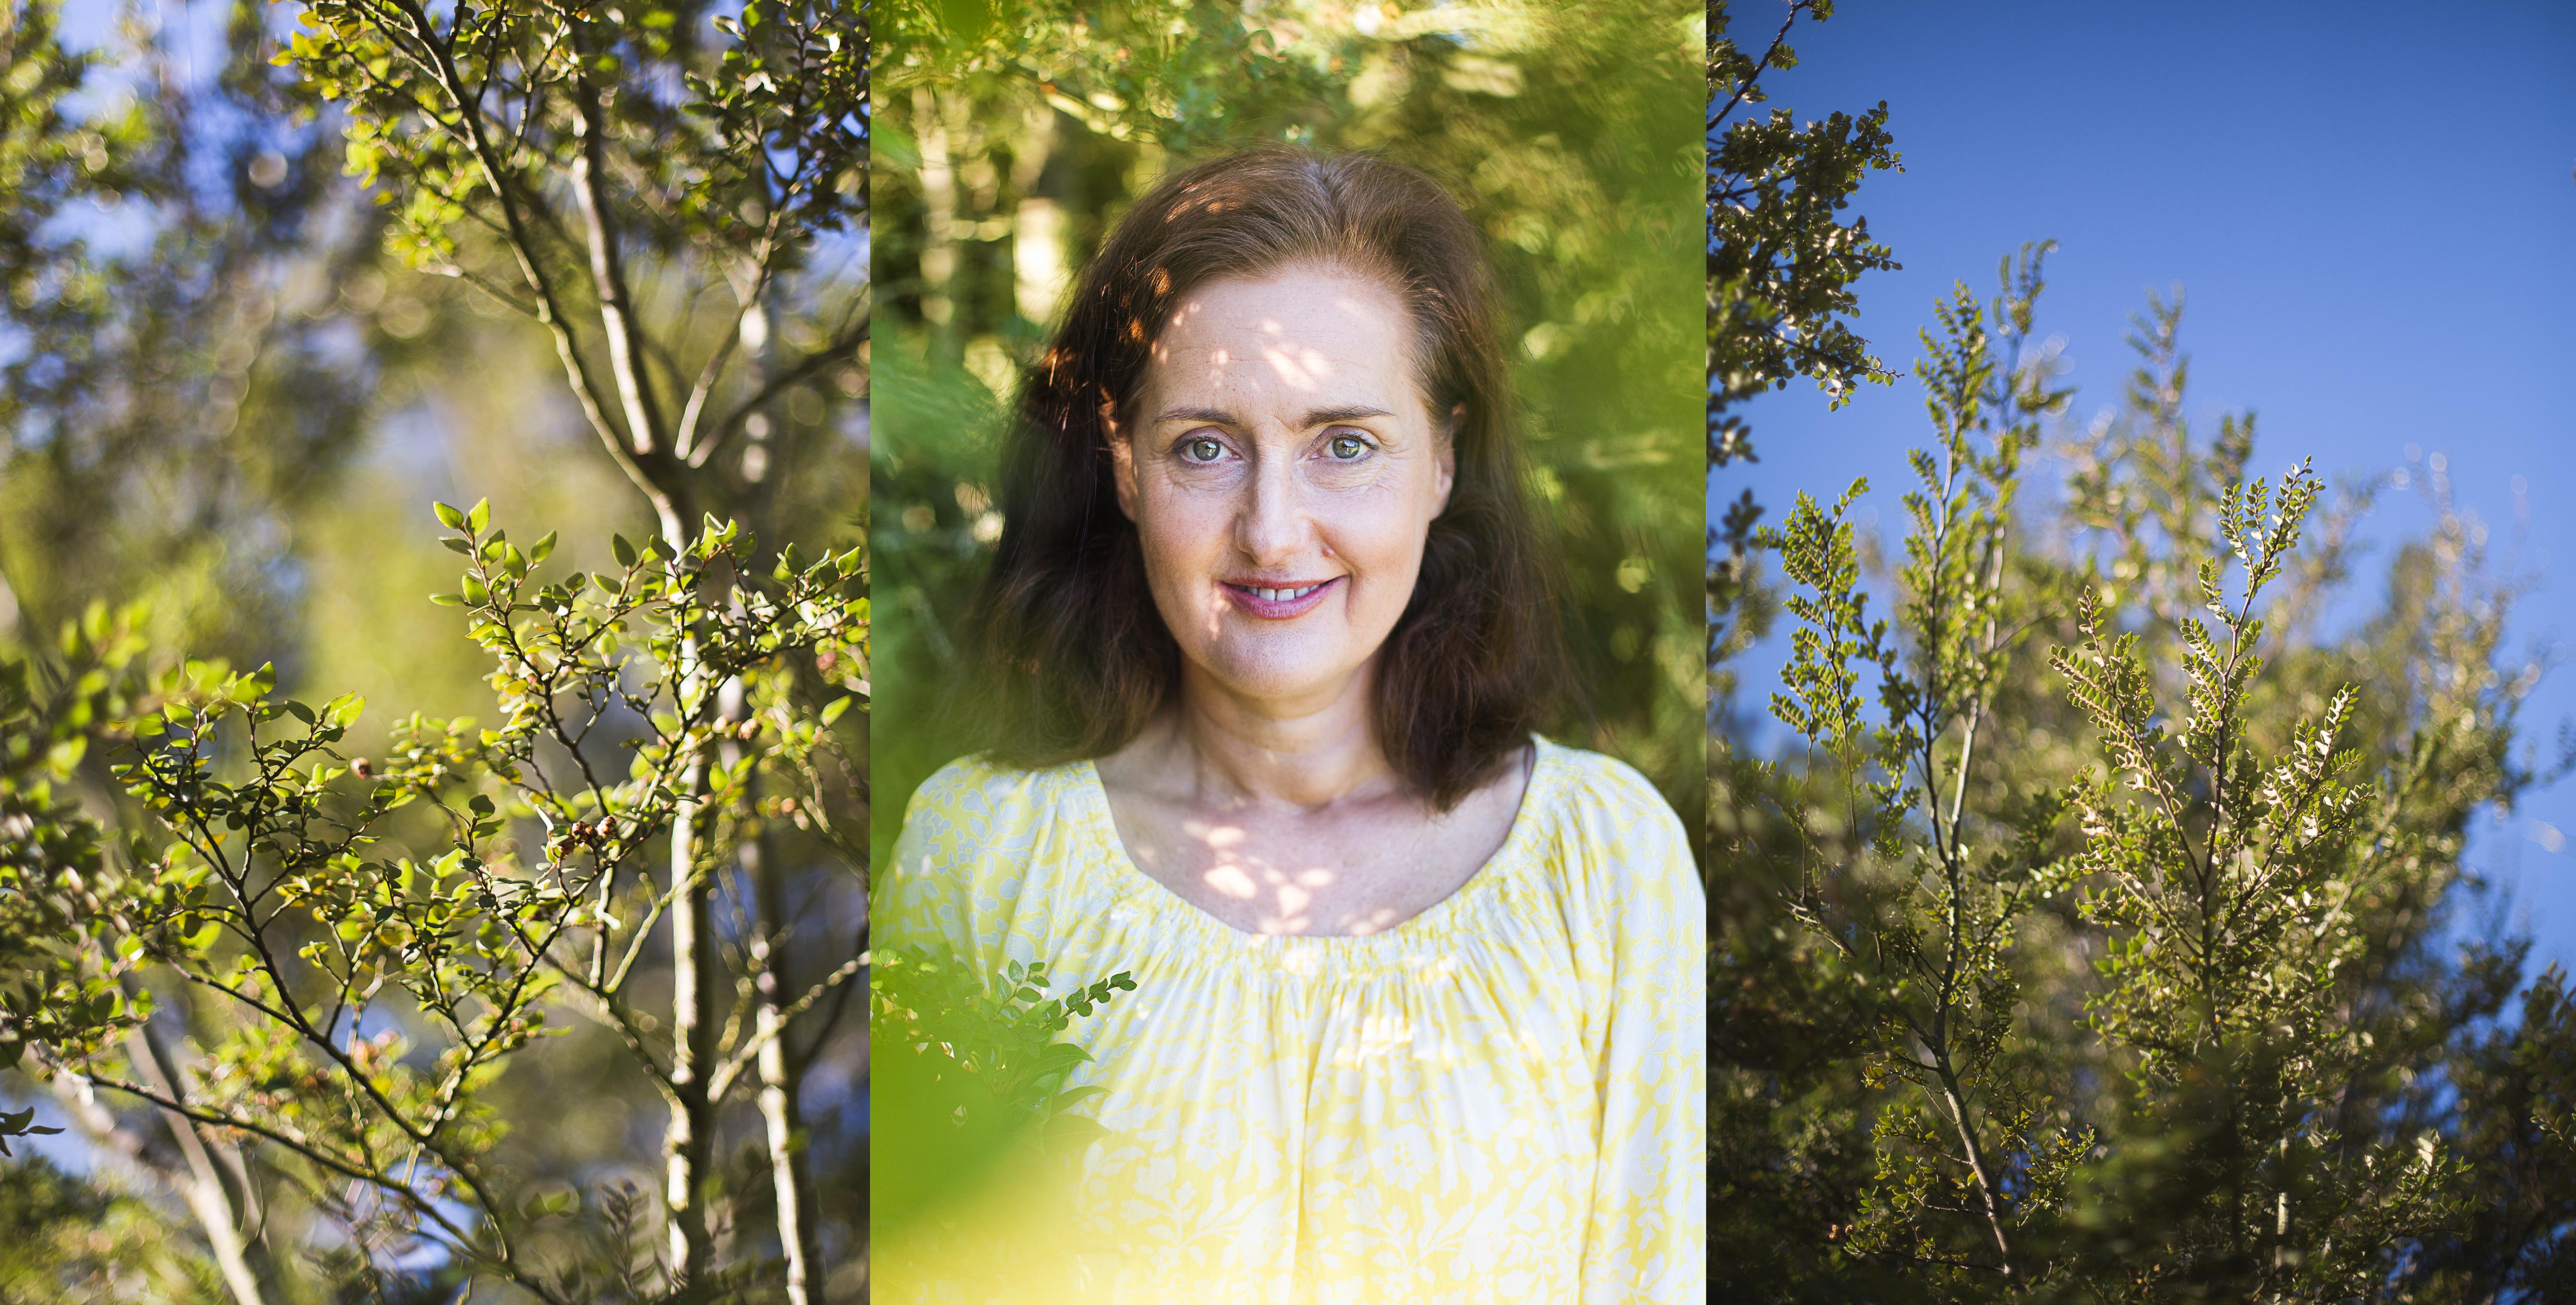 Portrait de Pippa-New Zealand-Milton-Pippa-Sarah Galvan Photographe-9-Sarah Galvan Photographe